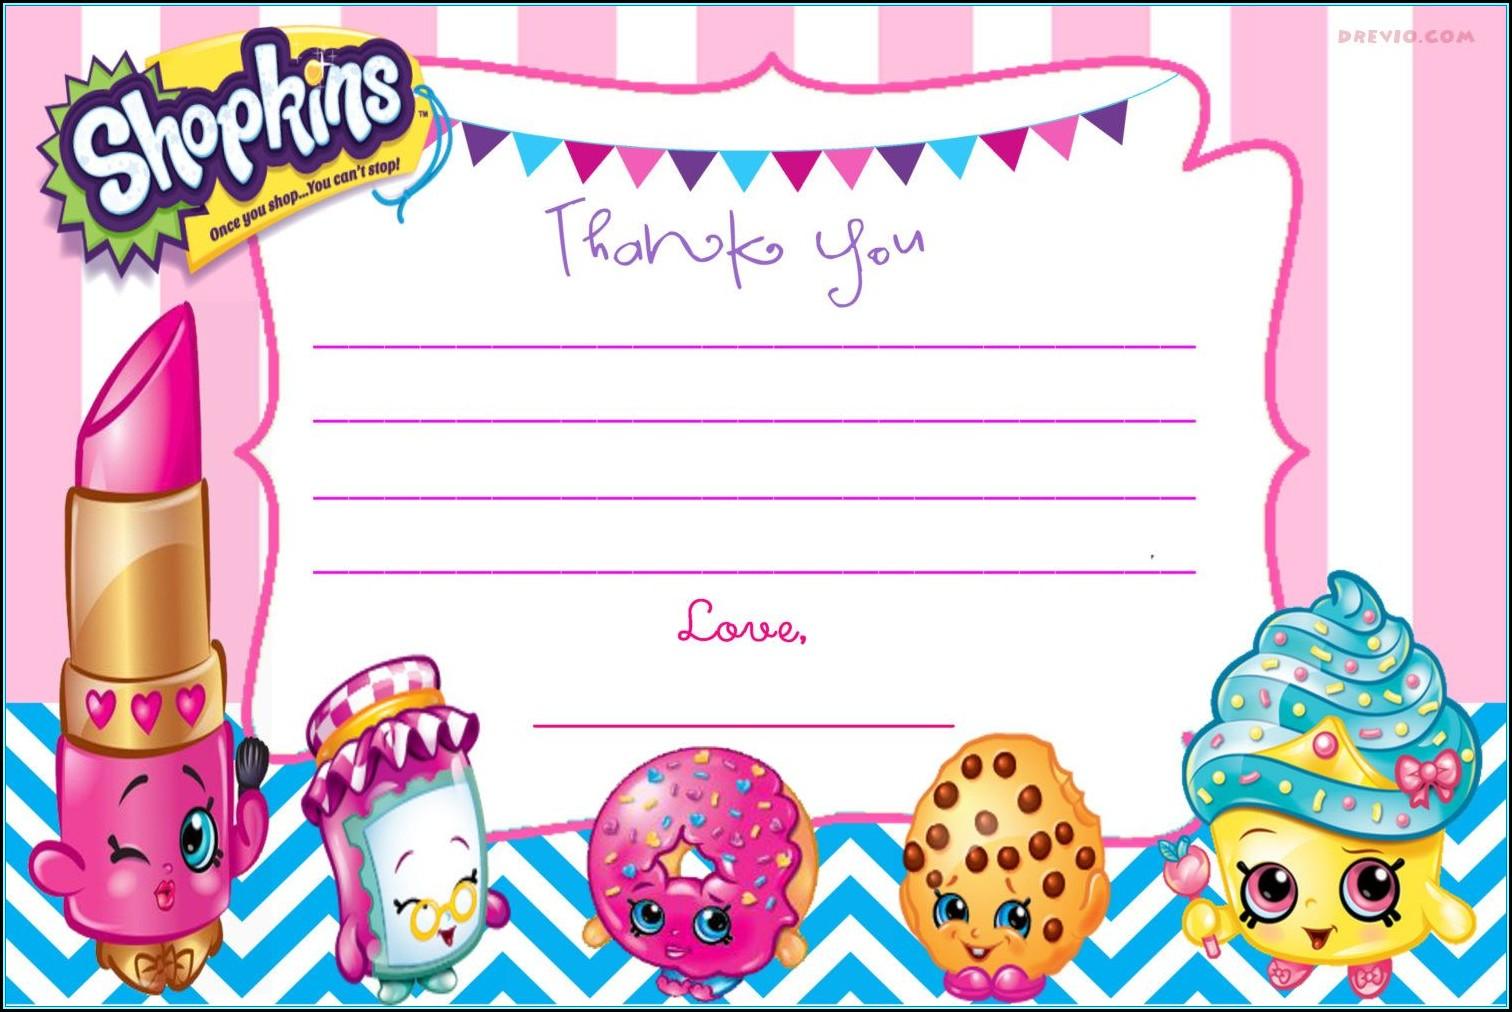 Shopkins Party Invitations Template